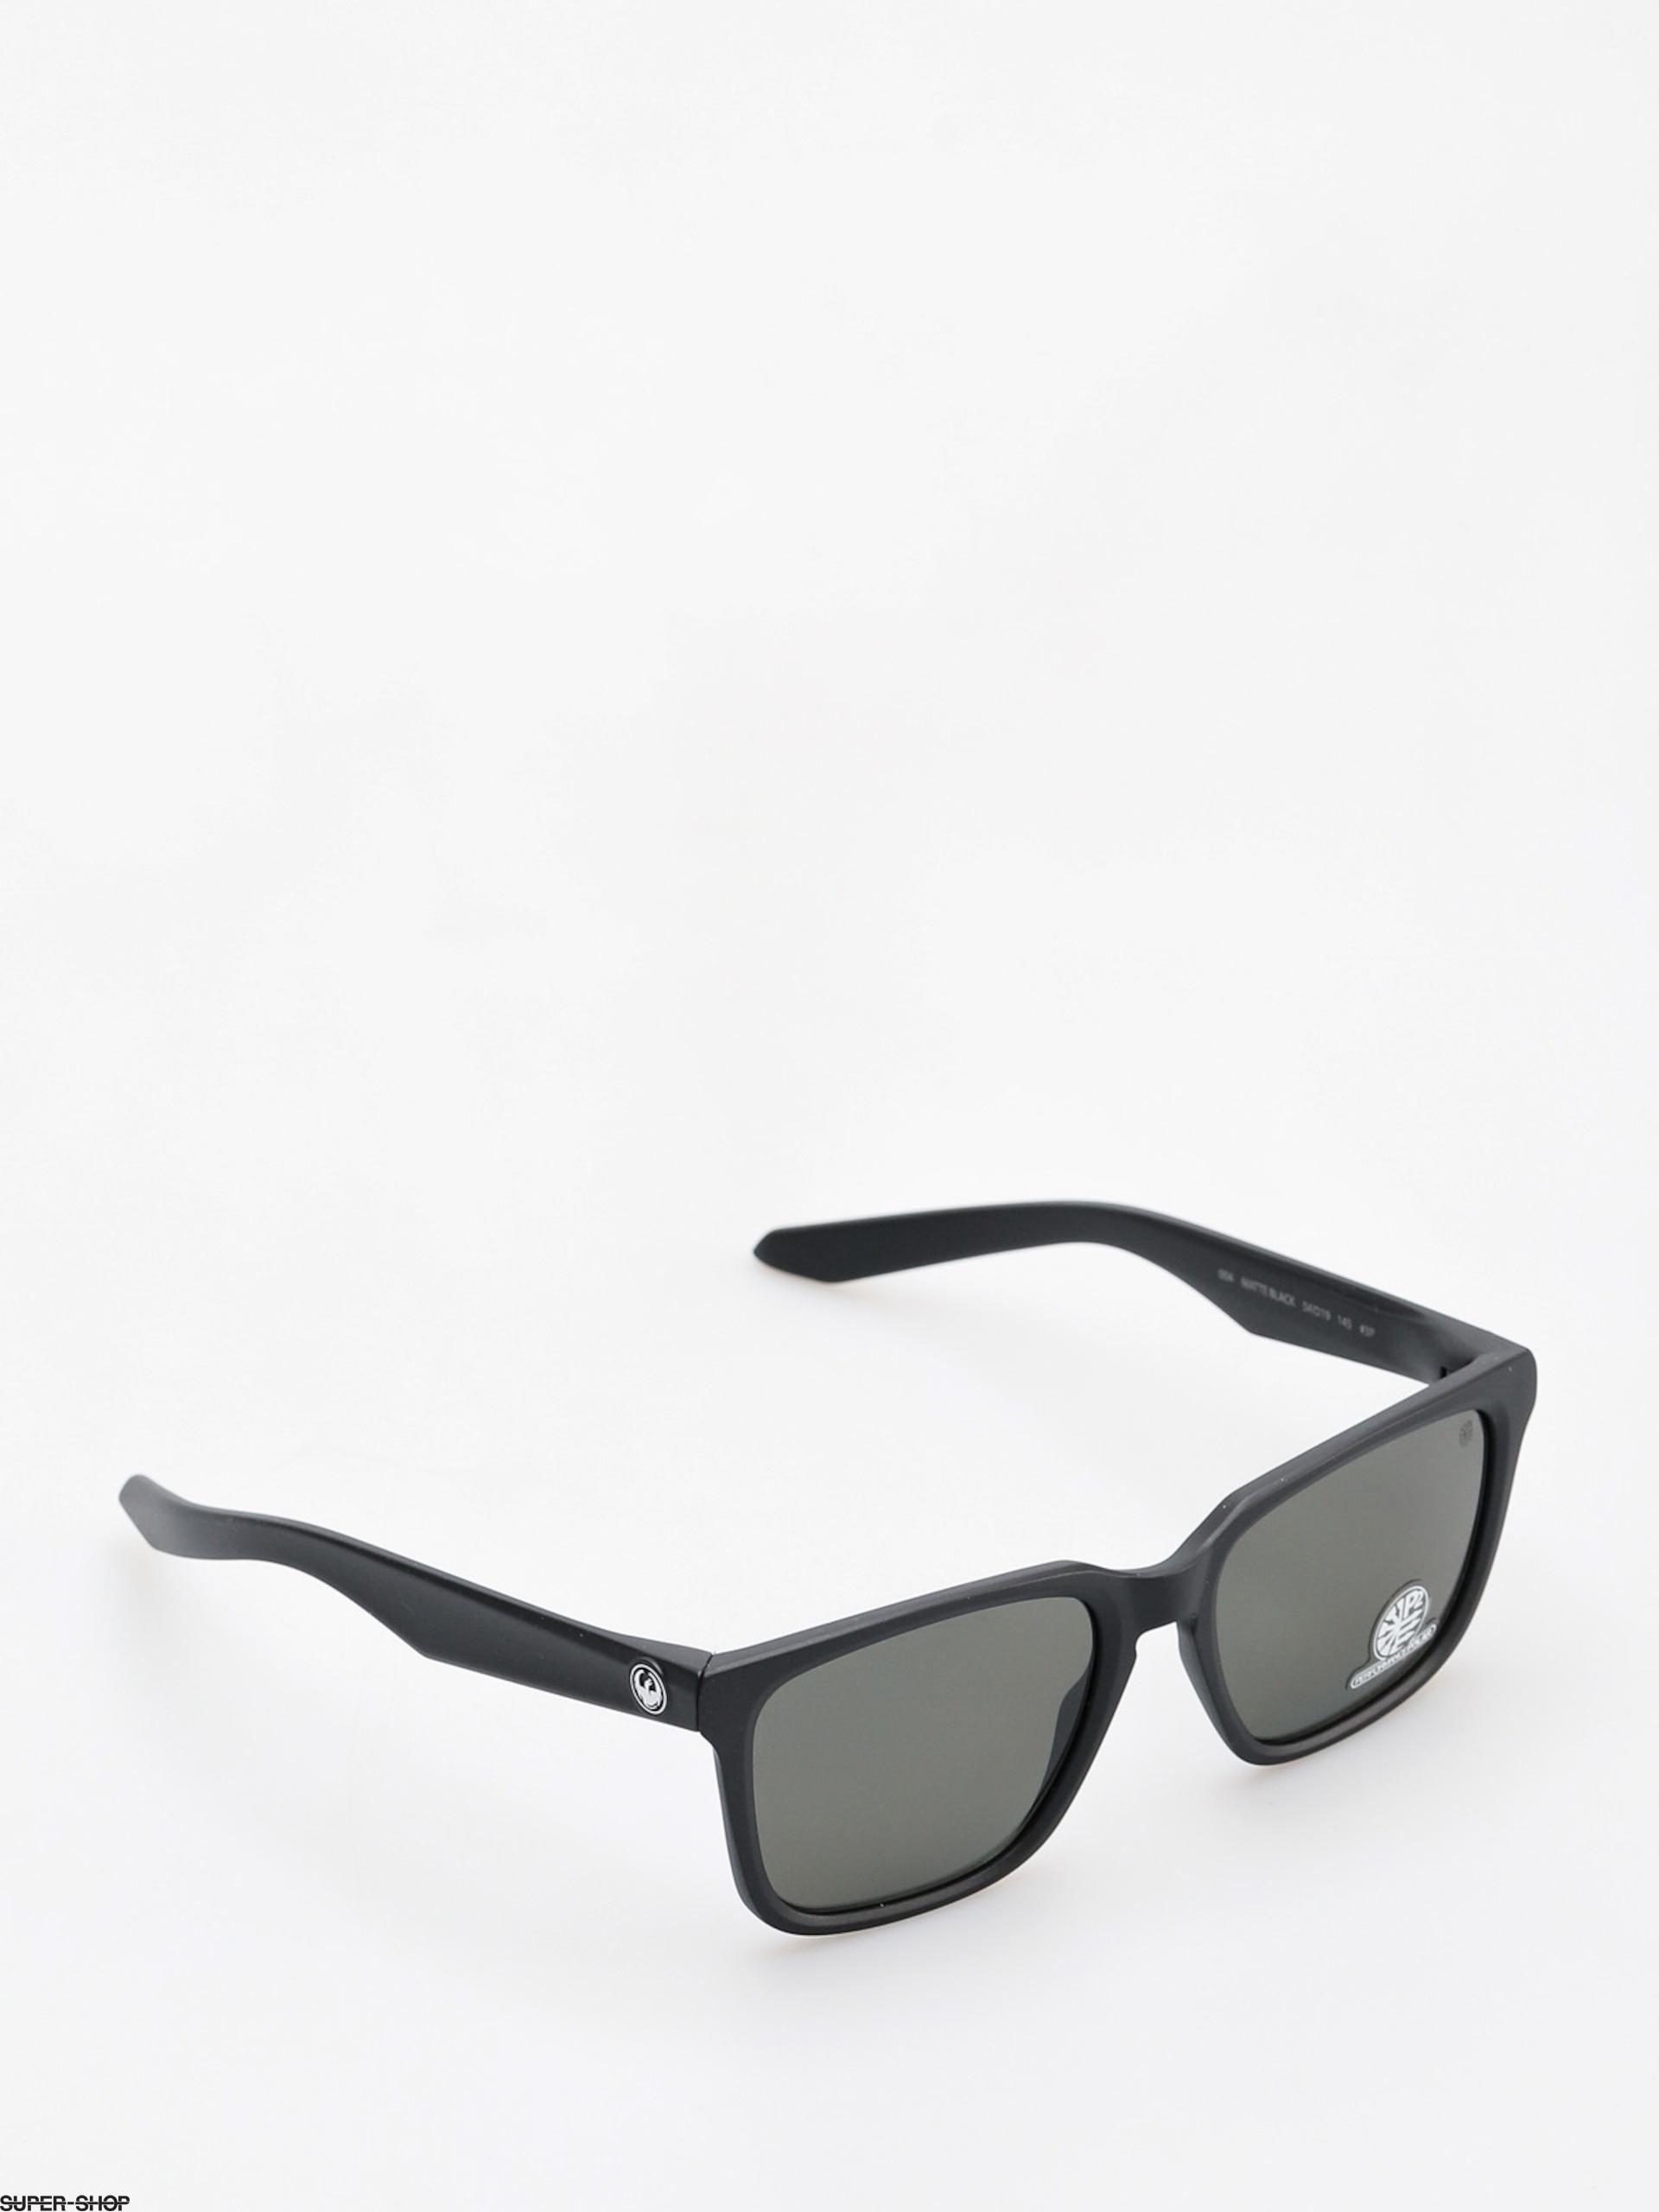 7f2e6681cce 960146-w1920-dragon-sunglasses-baile-matte-black-smoke-performance-polar.jpg